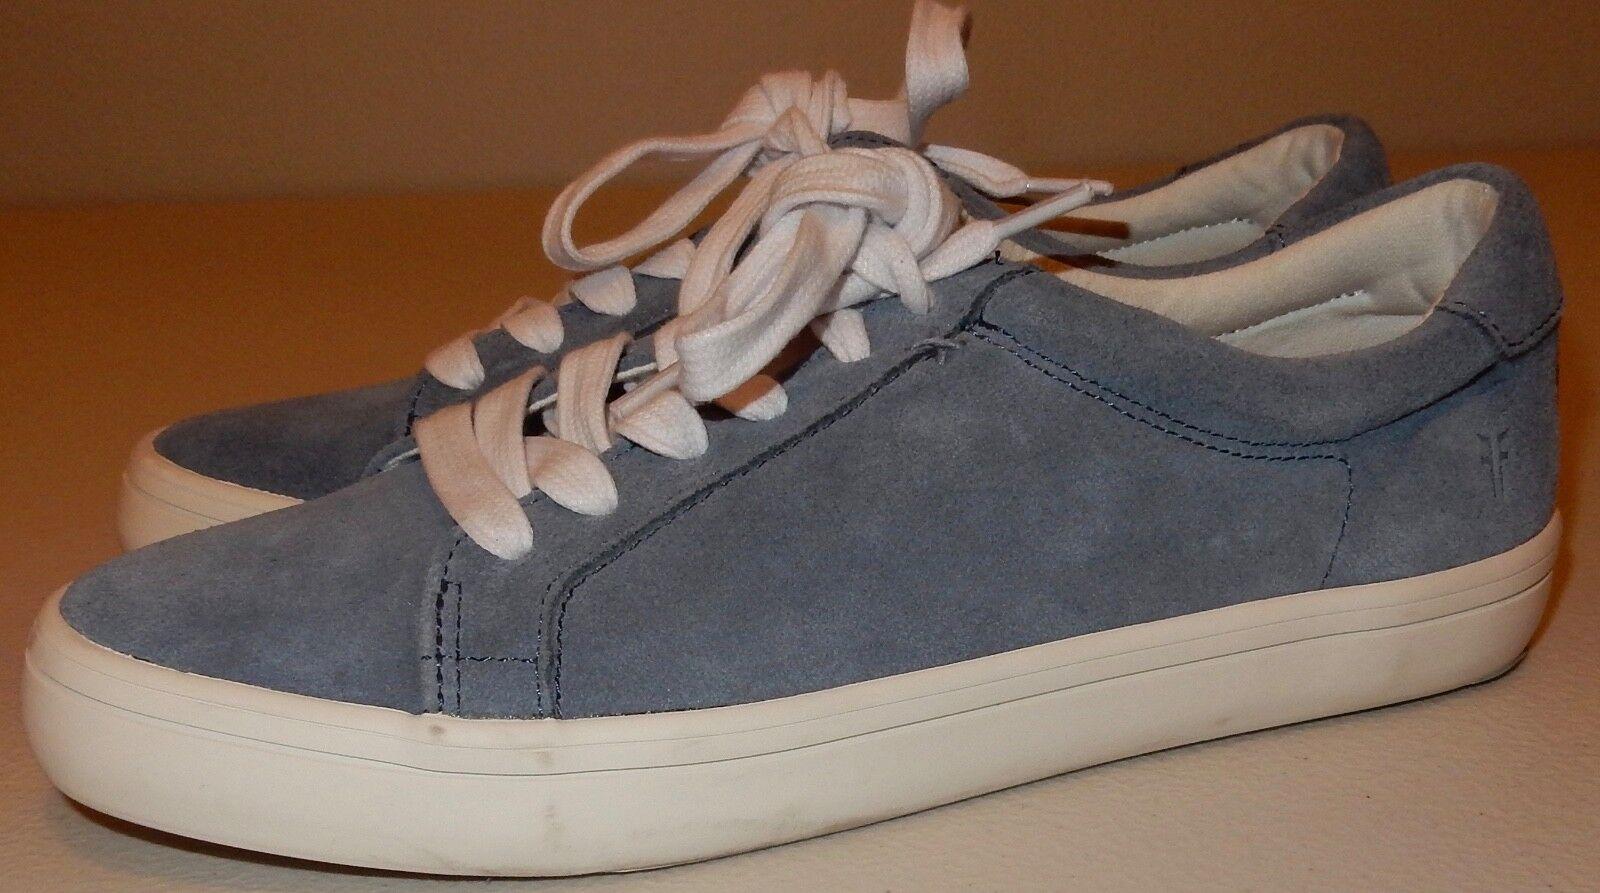 FRYE Blau Suede Damenschuhe Sneakers Schuhes Größe 7.5